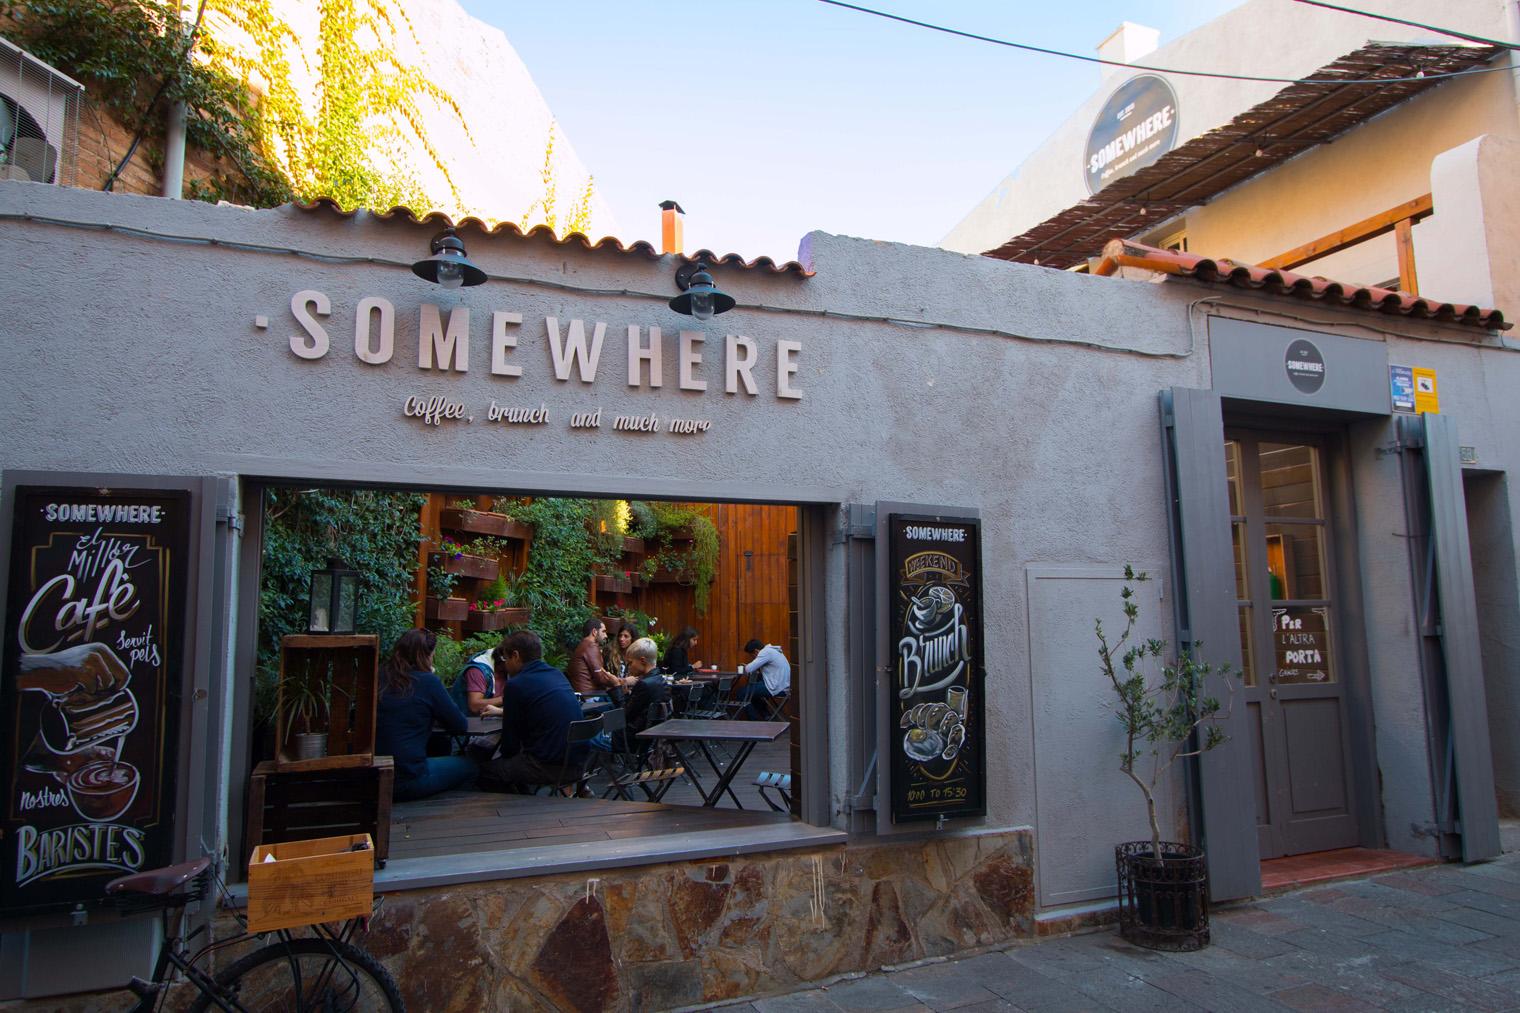 Somewhere caf brunch y mucho m s en sant cugat del - Mas duran sant quirze del valles ...